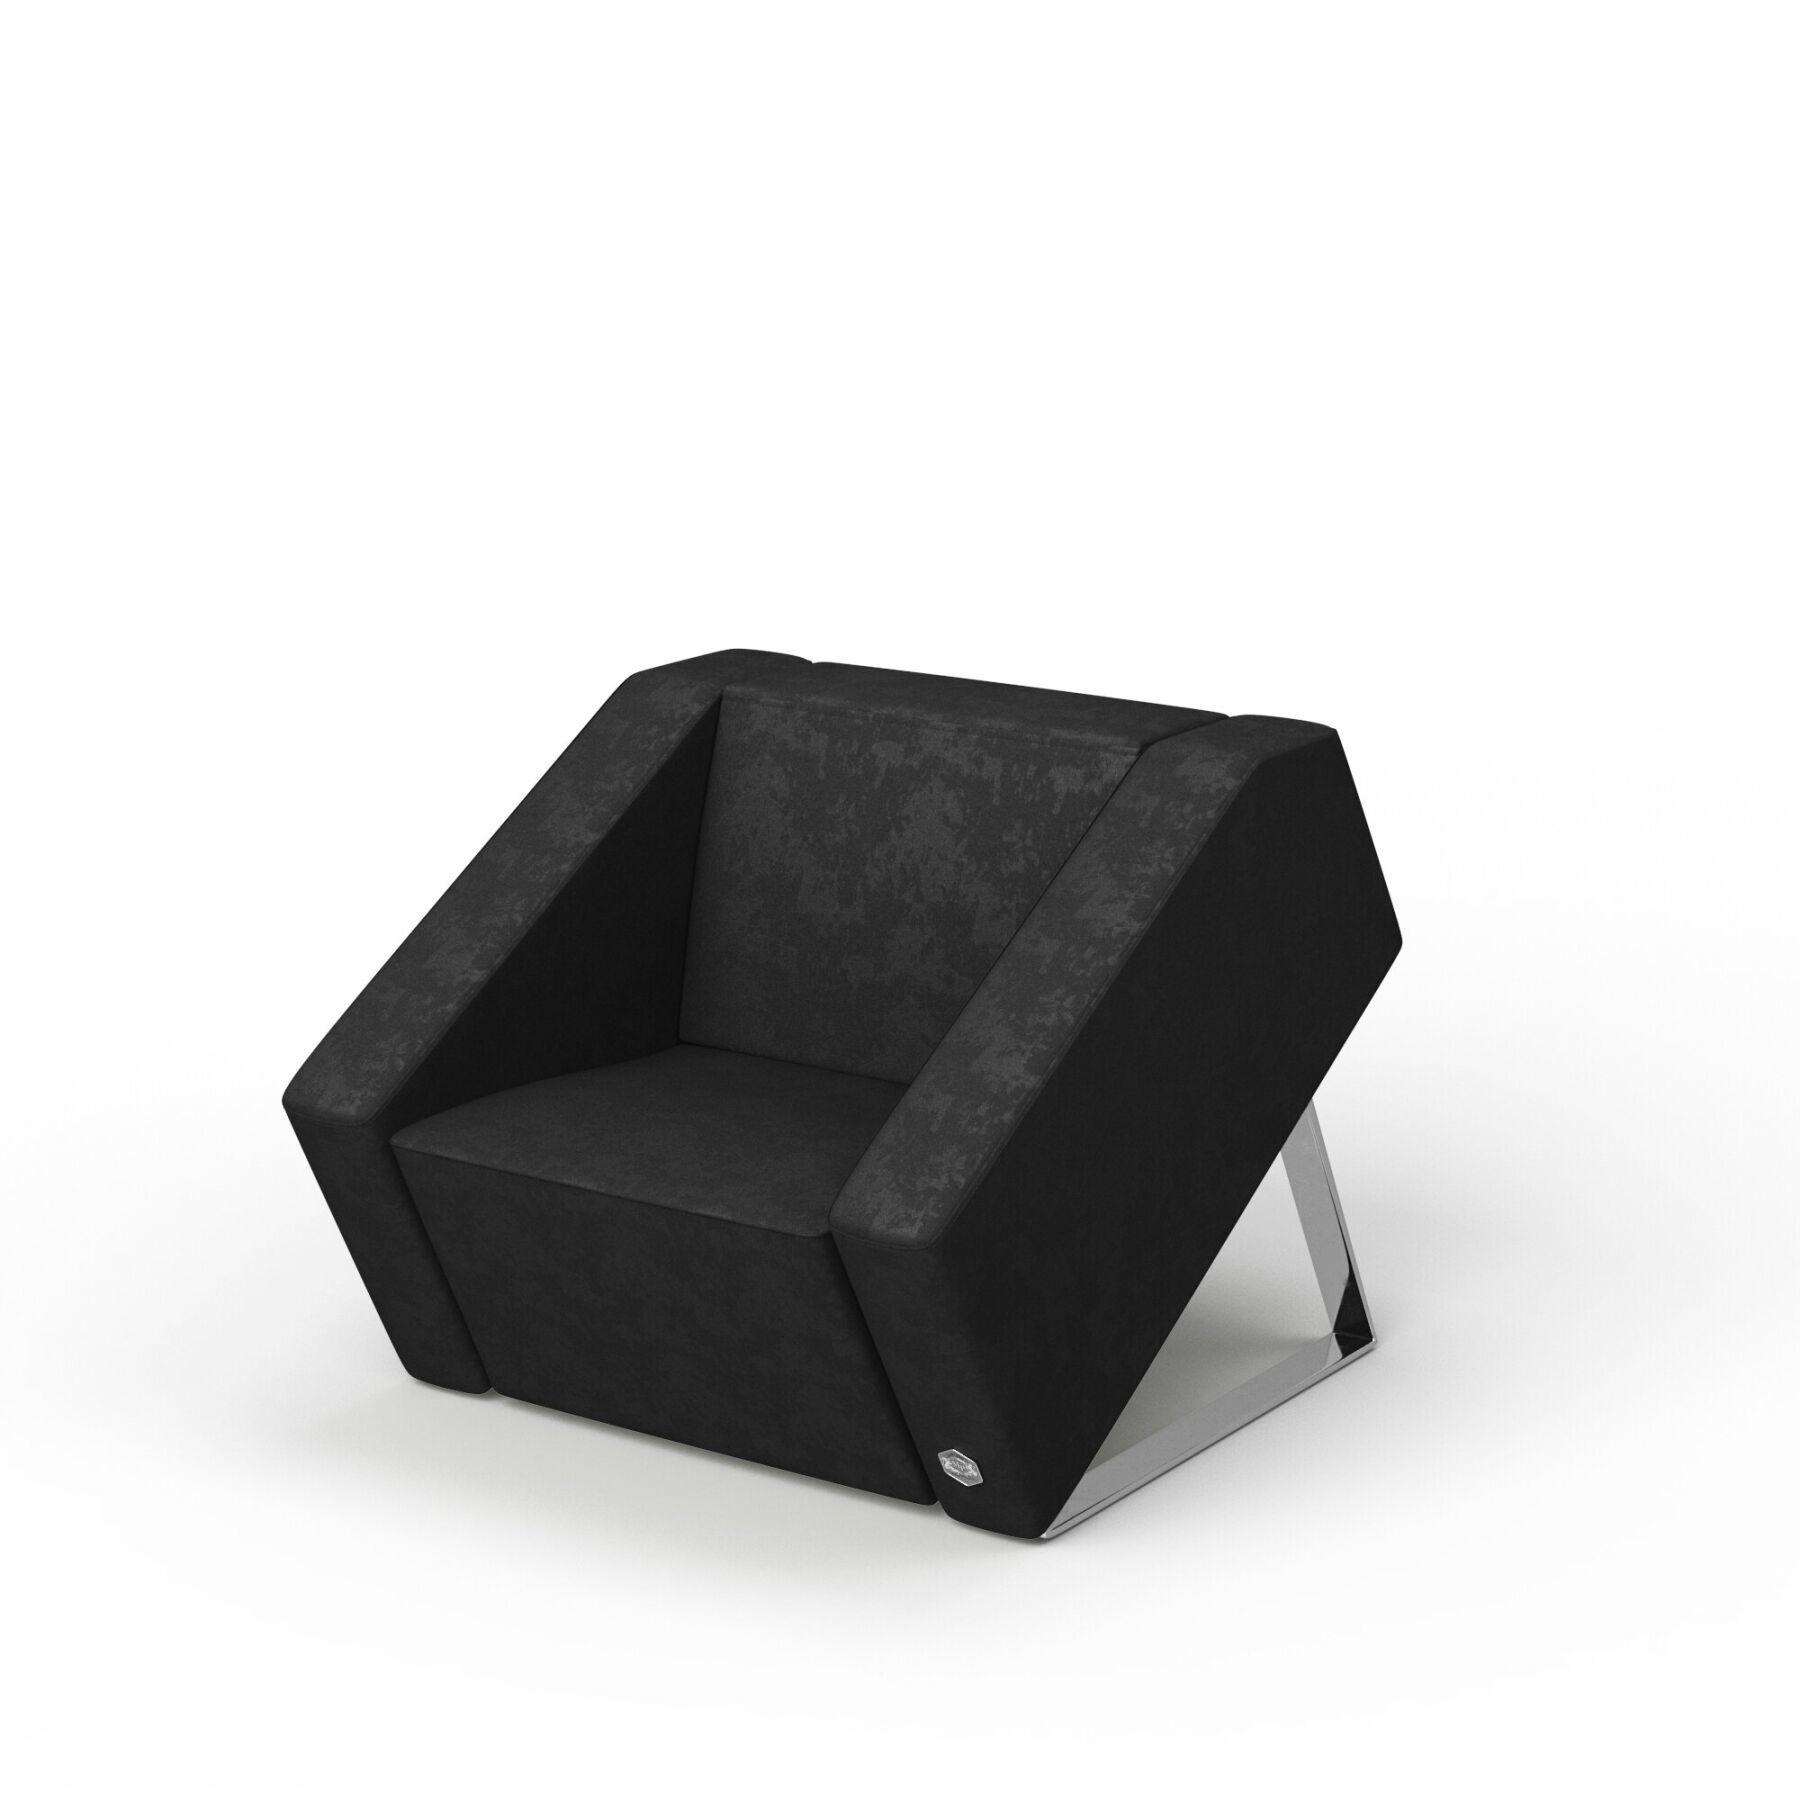 Мягкое кресло KULIK SYSTEM PLANE Антара 1